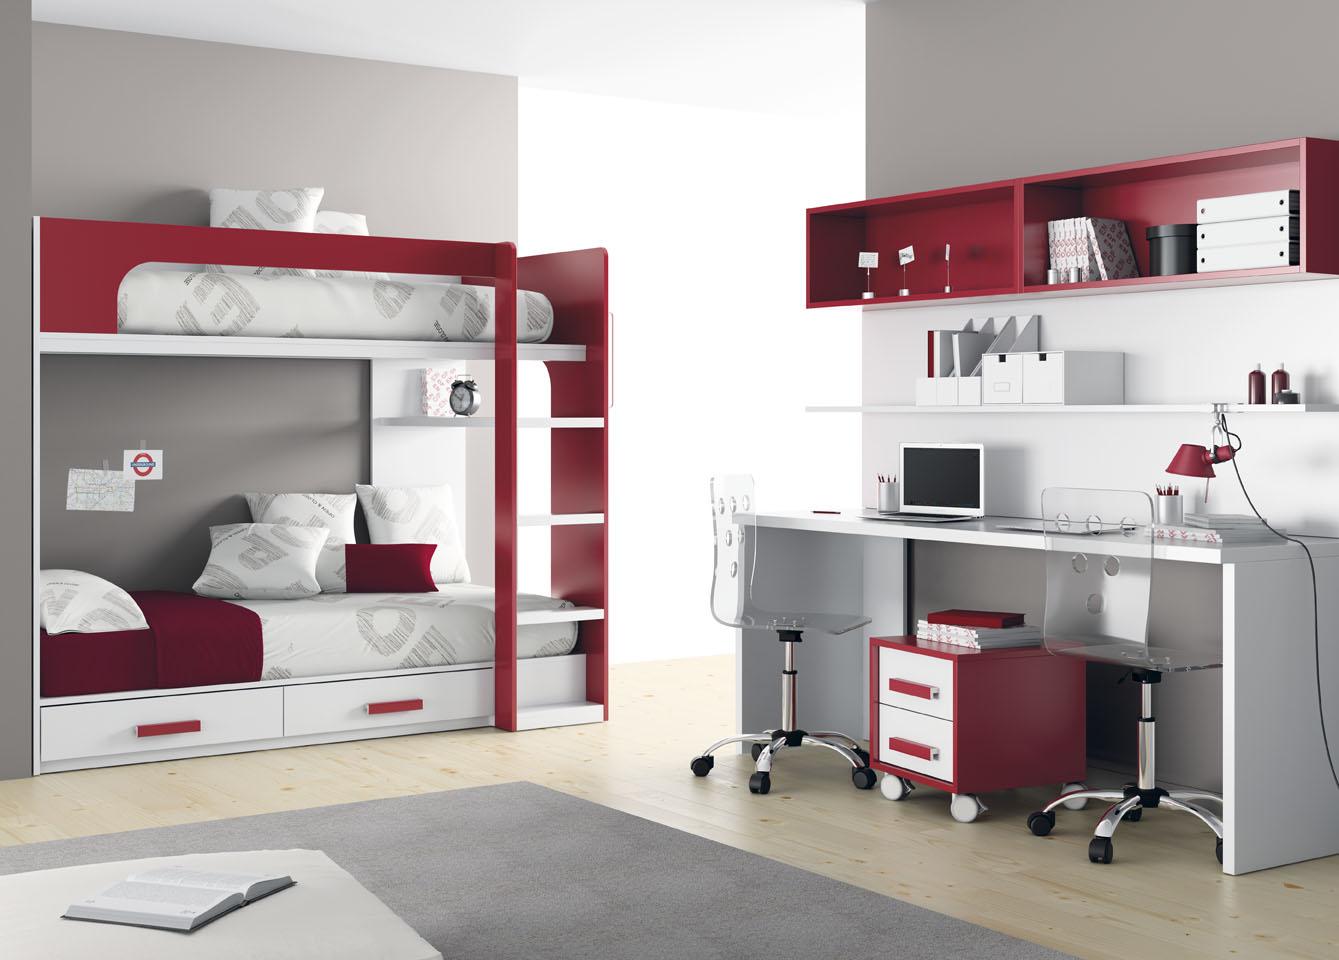 Literas de muebles ros frescas atrevidas y alegres for Em muebles